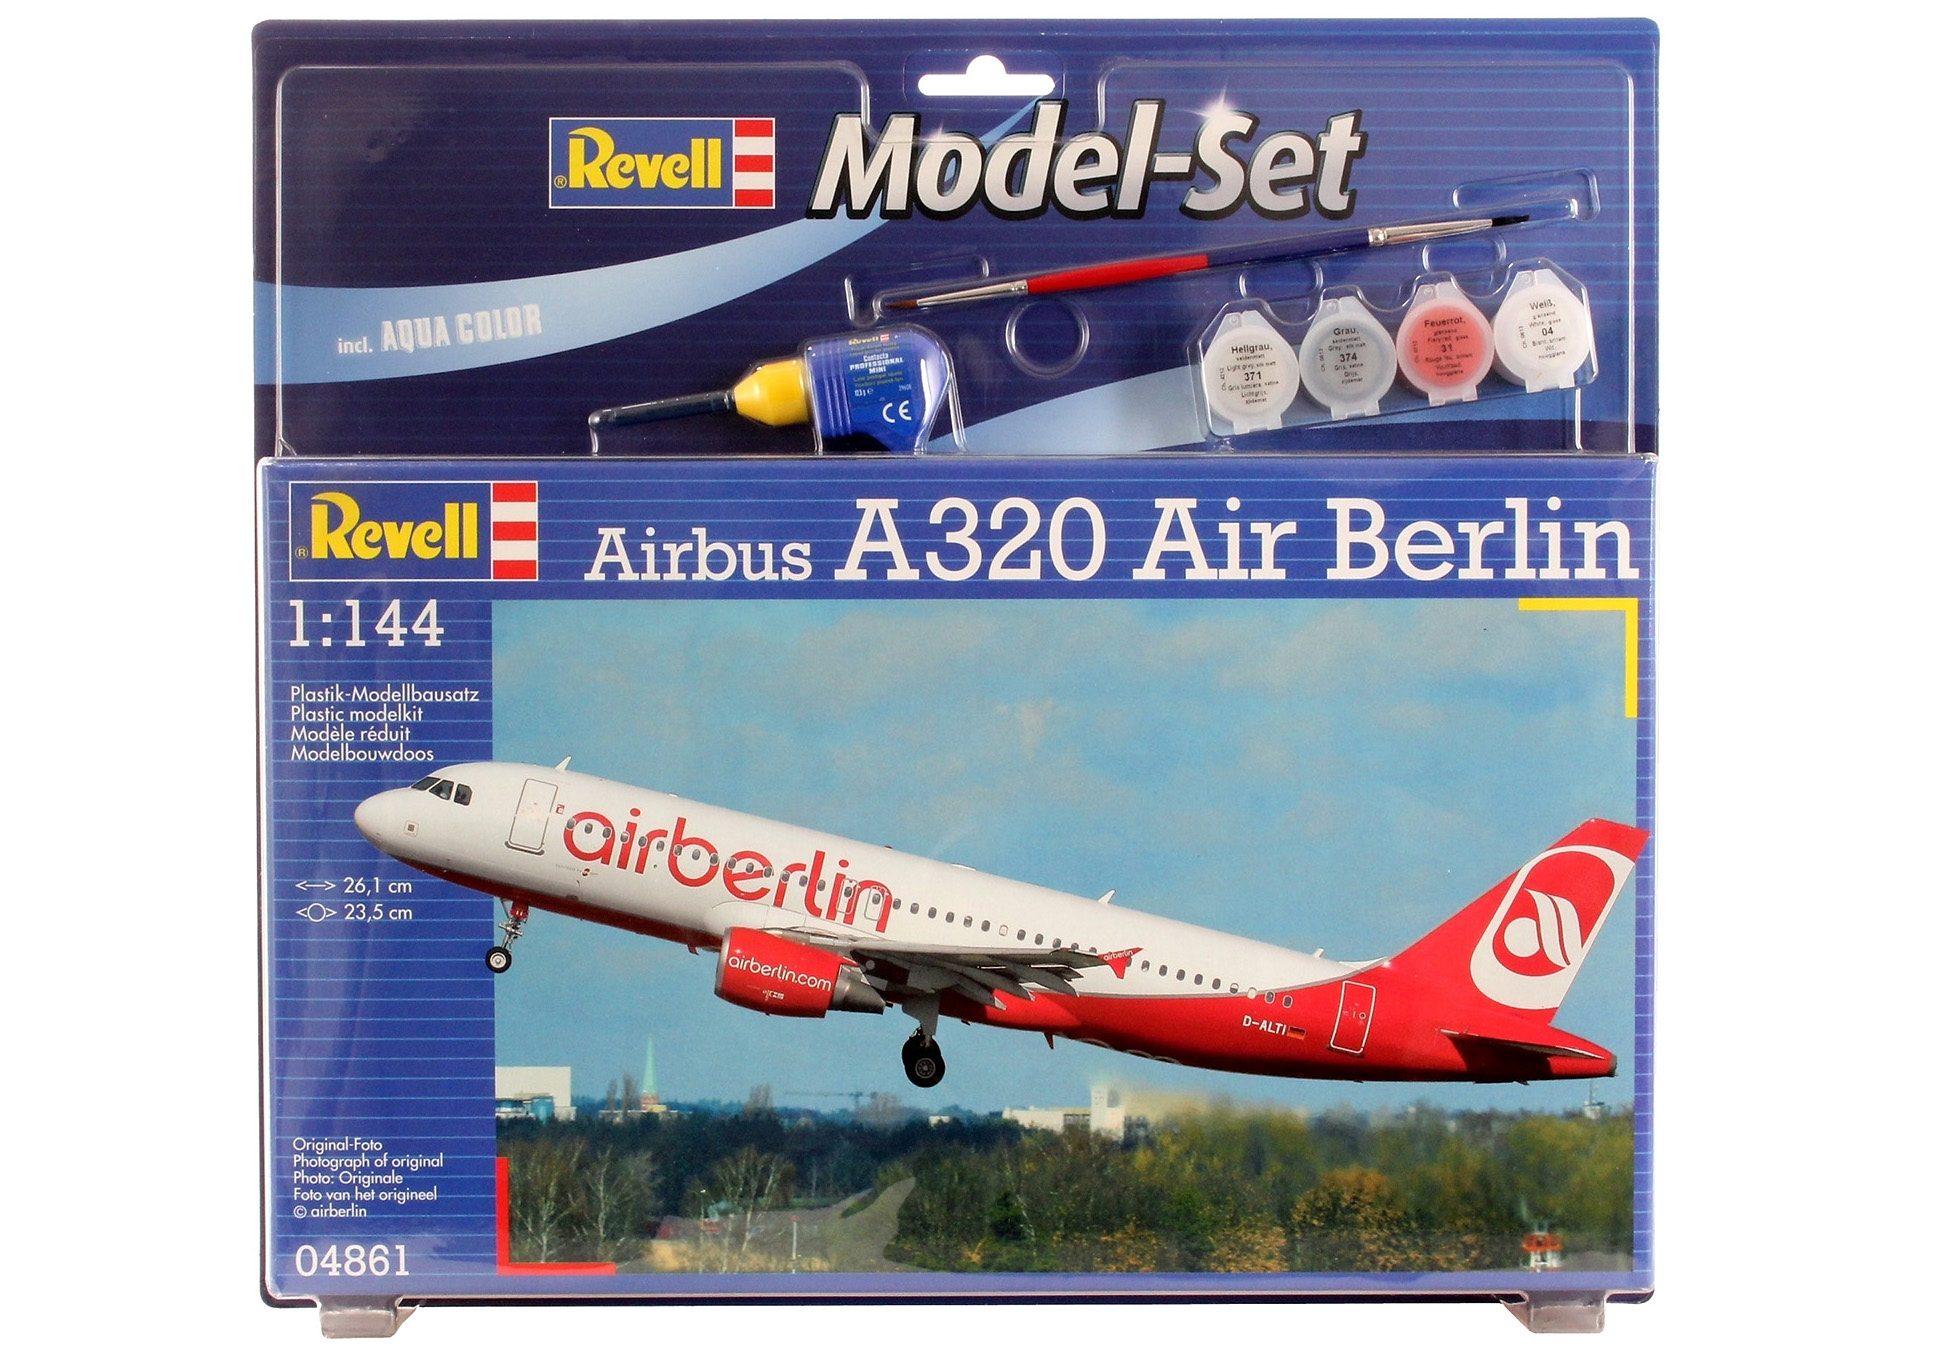 Revell® Modellbausatz Flugzeug mit Zubehör, Maßstab 1:144 , »Model Set - Airbus A320 AirBerlin«